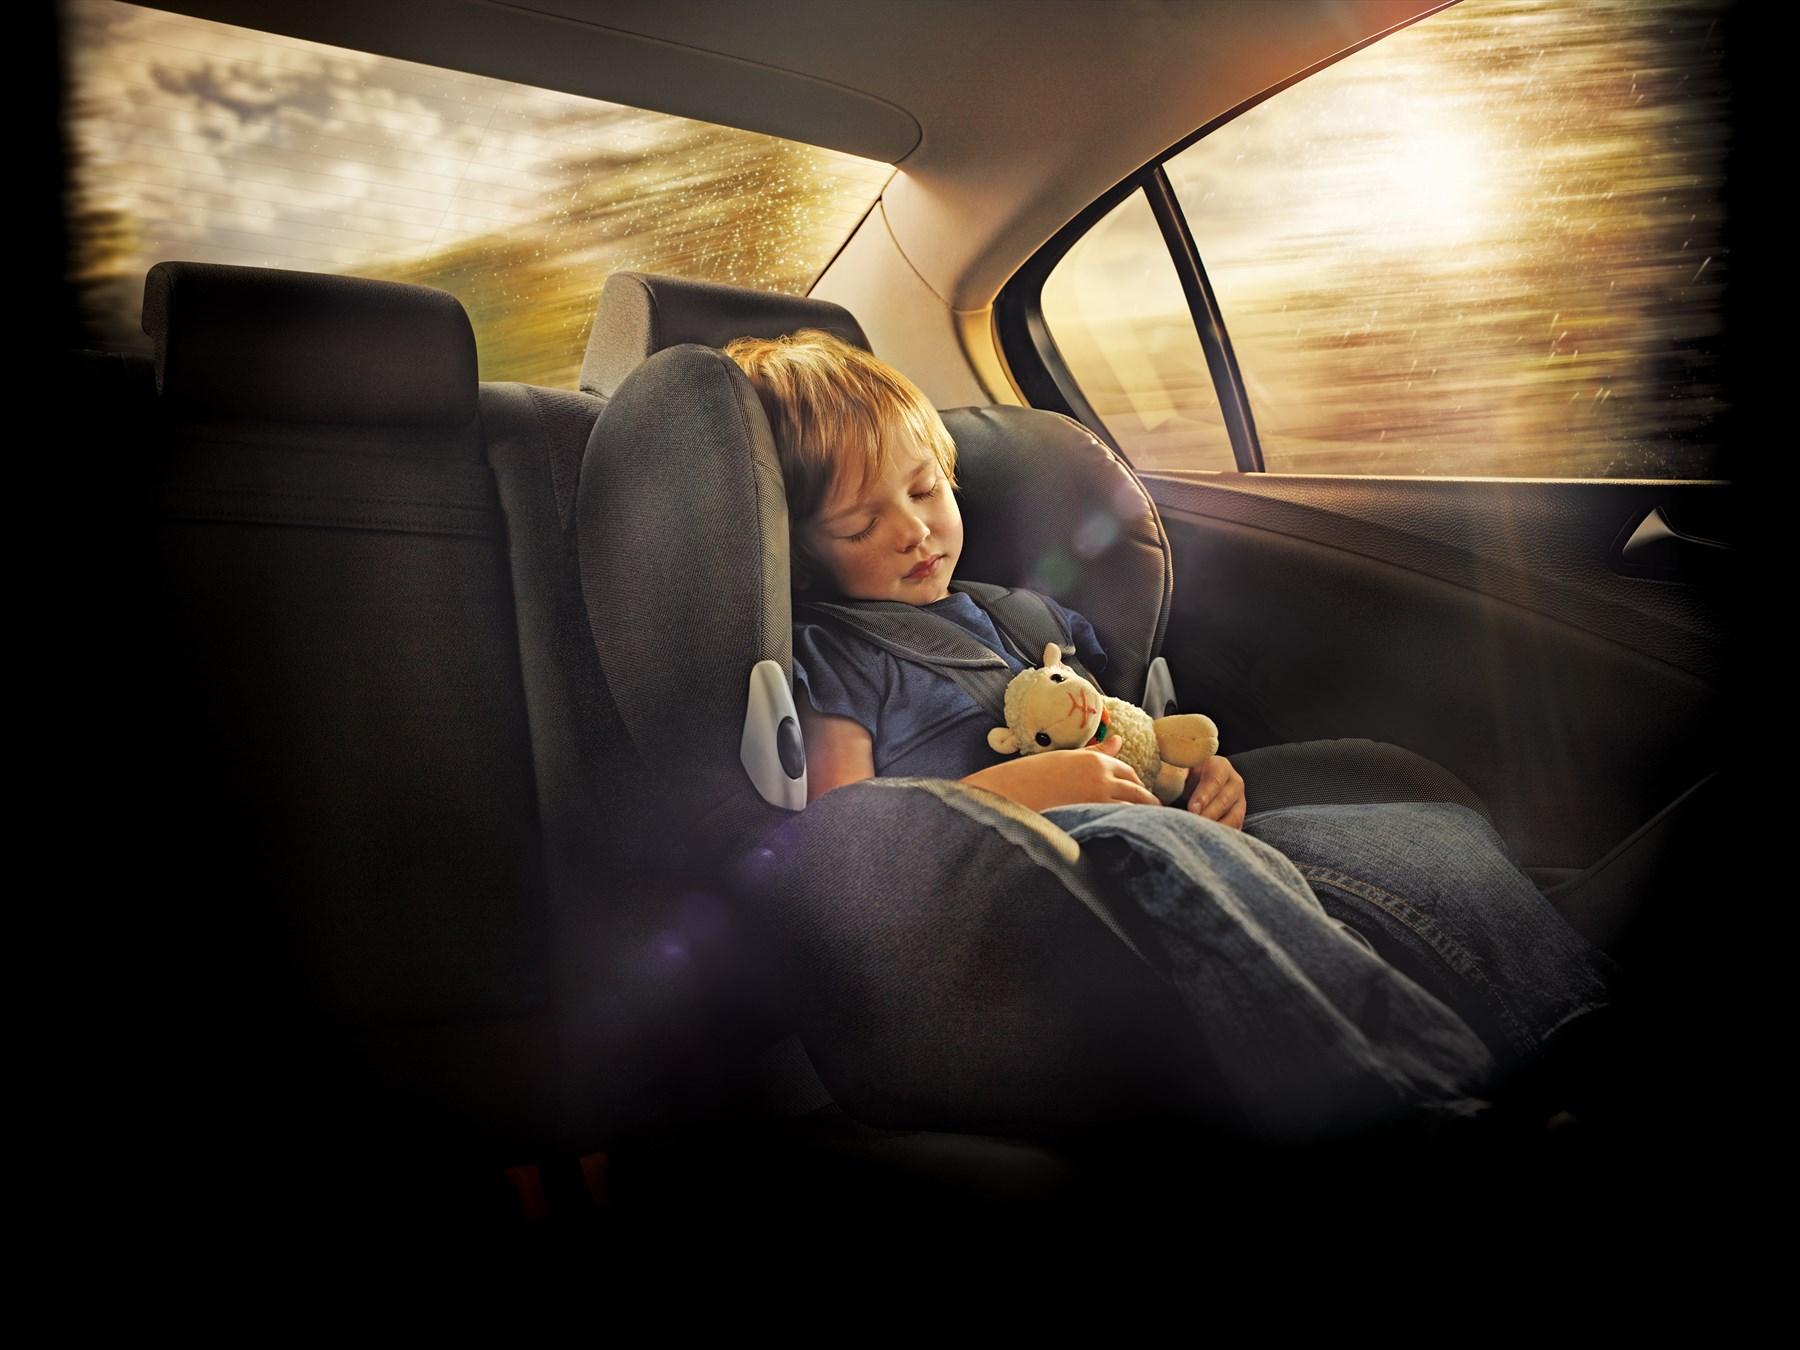 sleeping-child_1800x1800